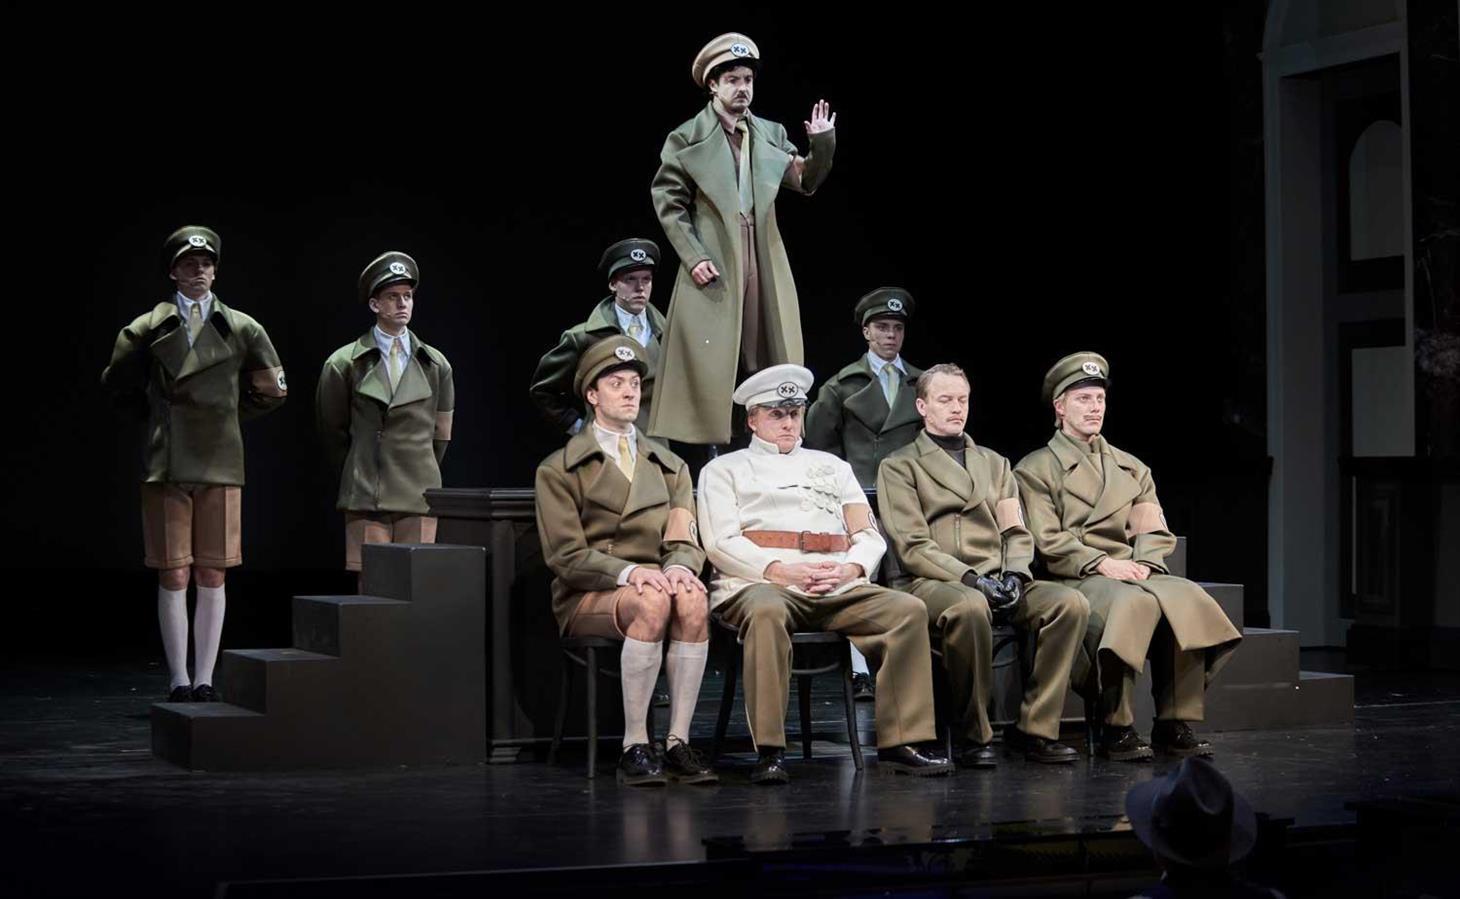 The Dictator - Rogaland Teater - Director: Morten Joakim - Costume Design: Christina Lovery - Foto: Stig Håvard Dirdal 2017